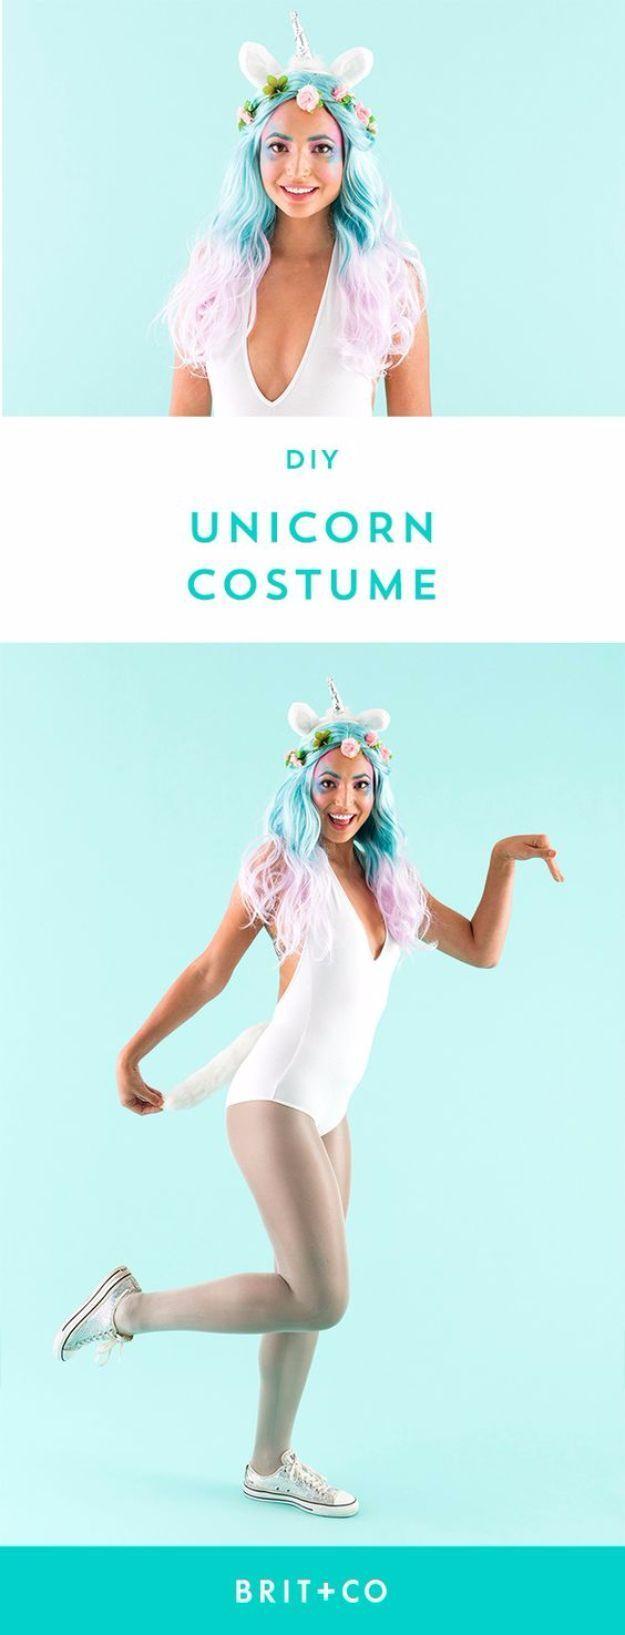 Best diy halloween costume ideas diy unicorn costume do it best diy halloween costume ideas diy unicorn costume do it yourself costumes solutioingenieria Image collections